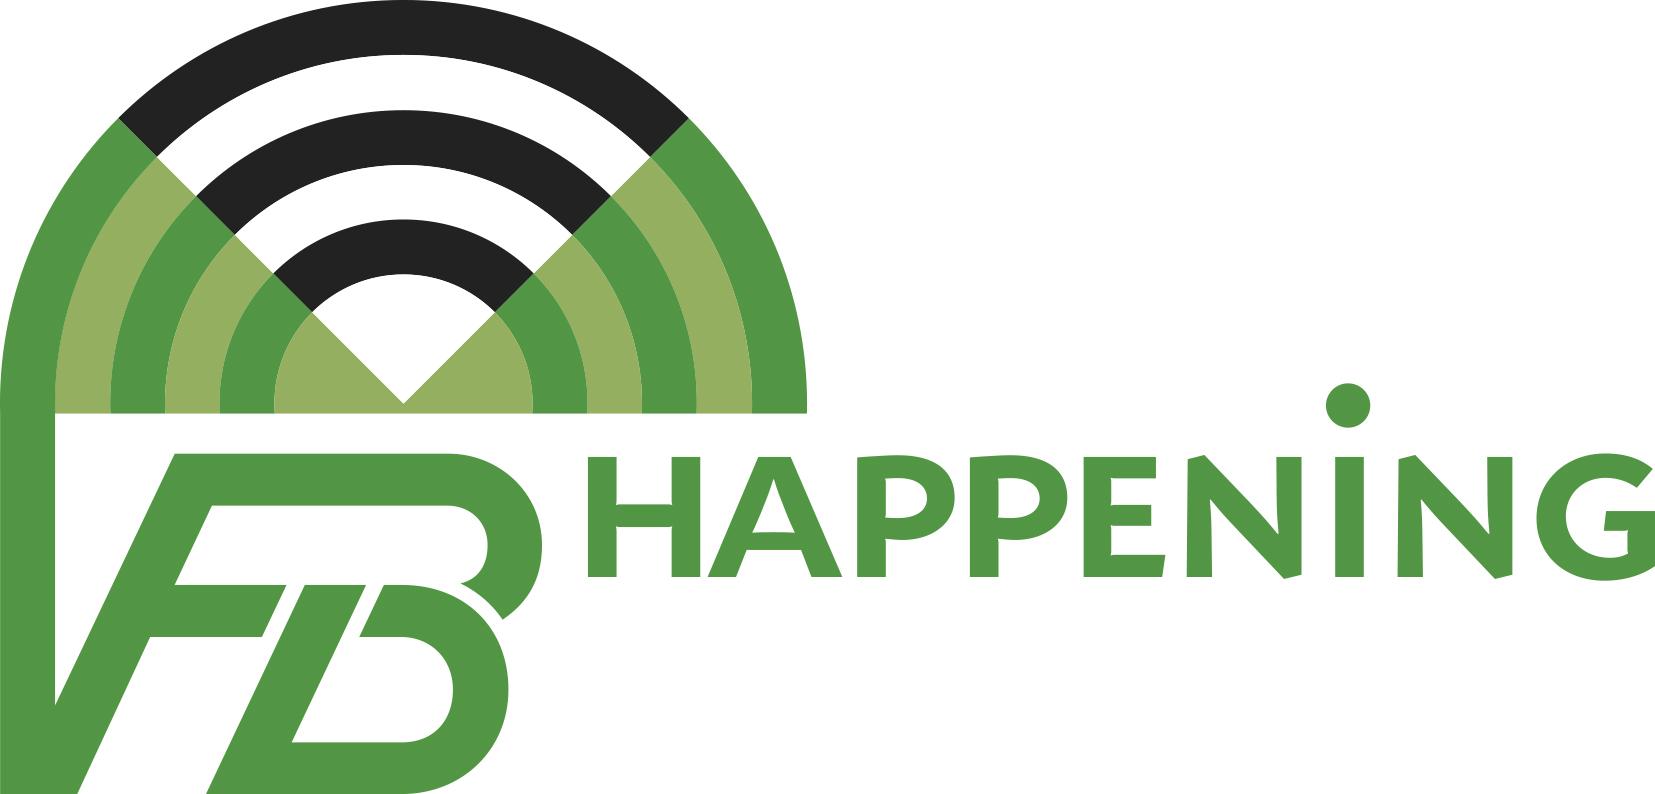 VFB_Happening_logo